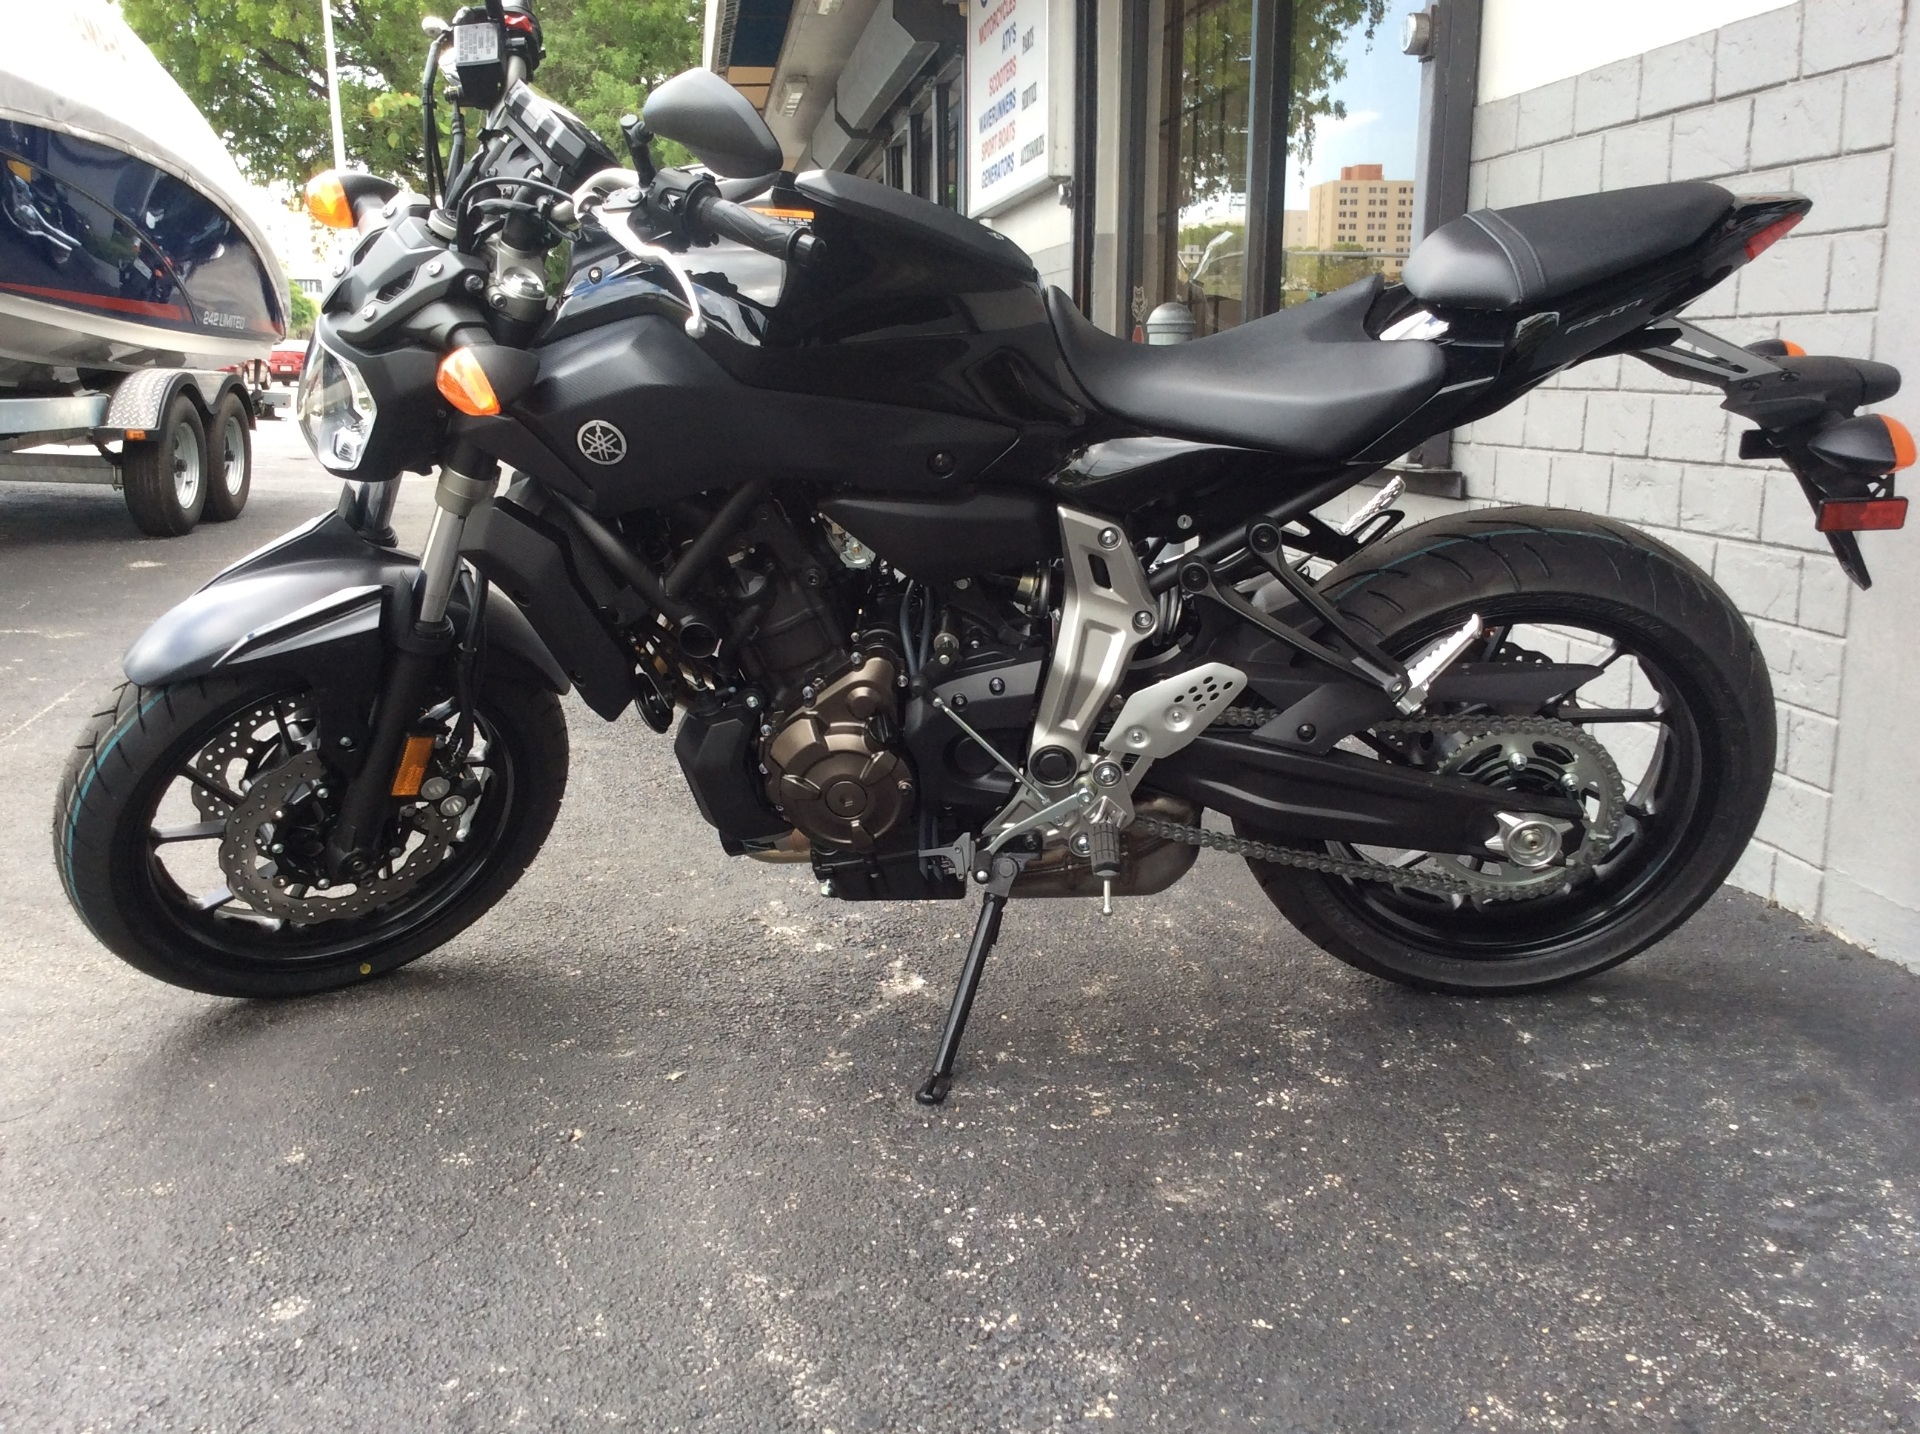 2016 Yamaha FZ-07 in Miami, Florida